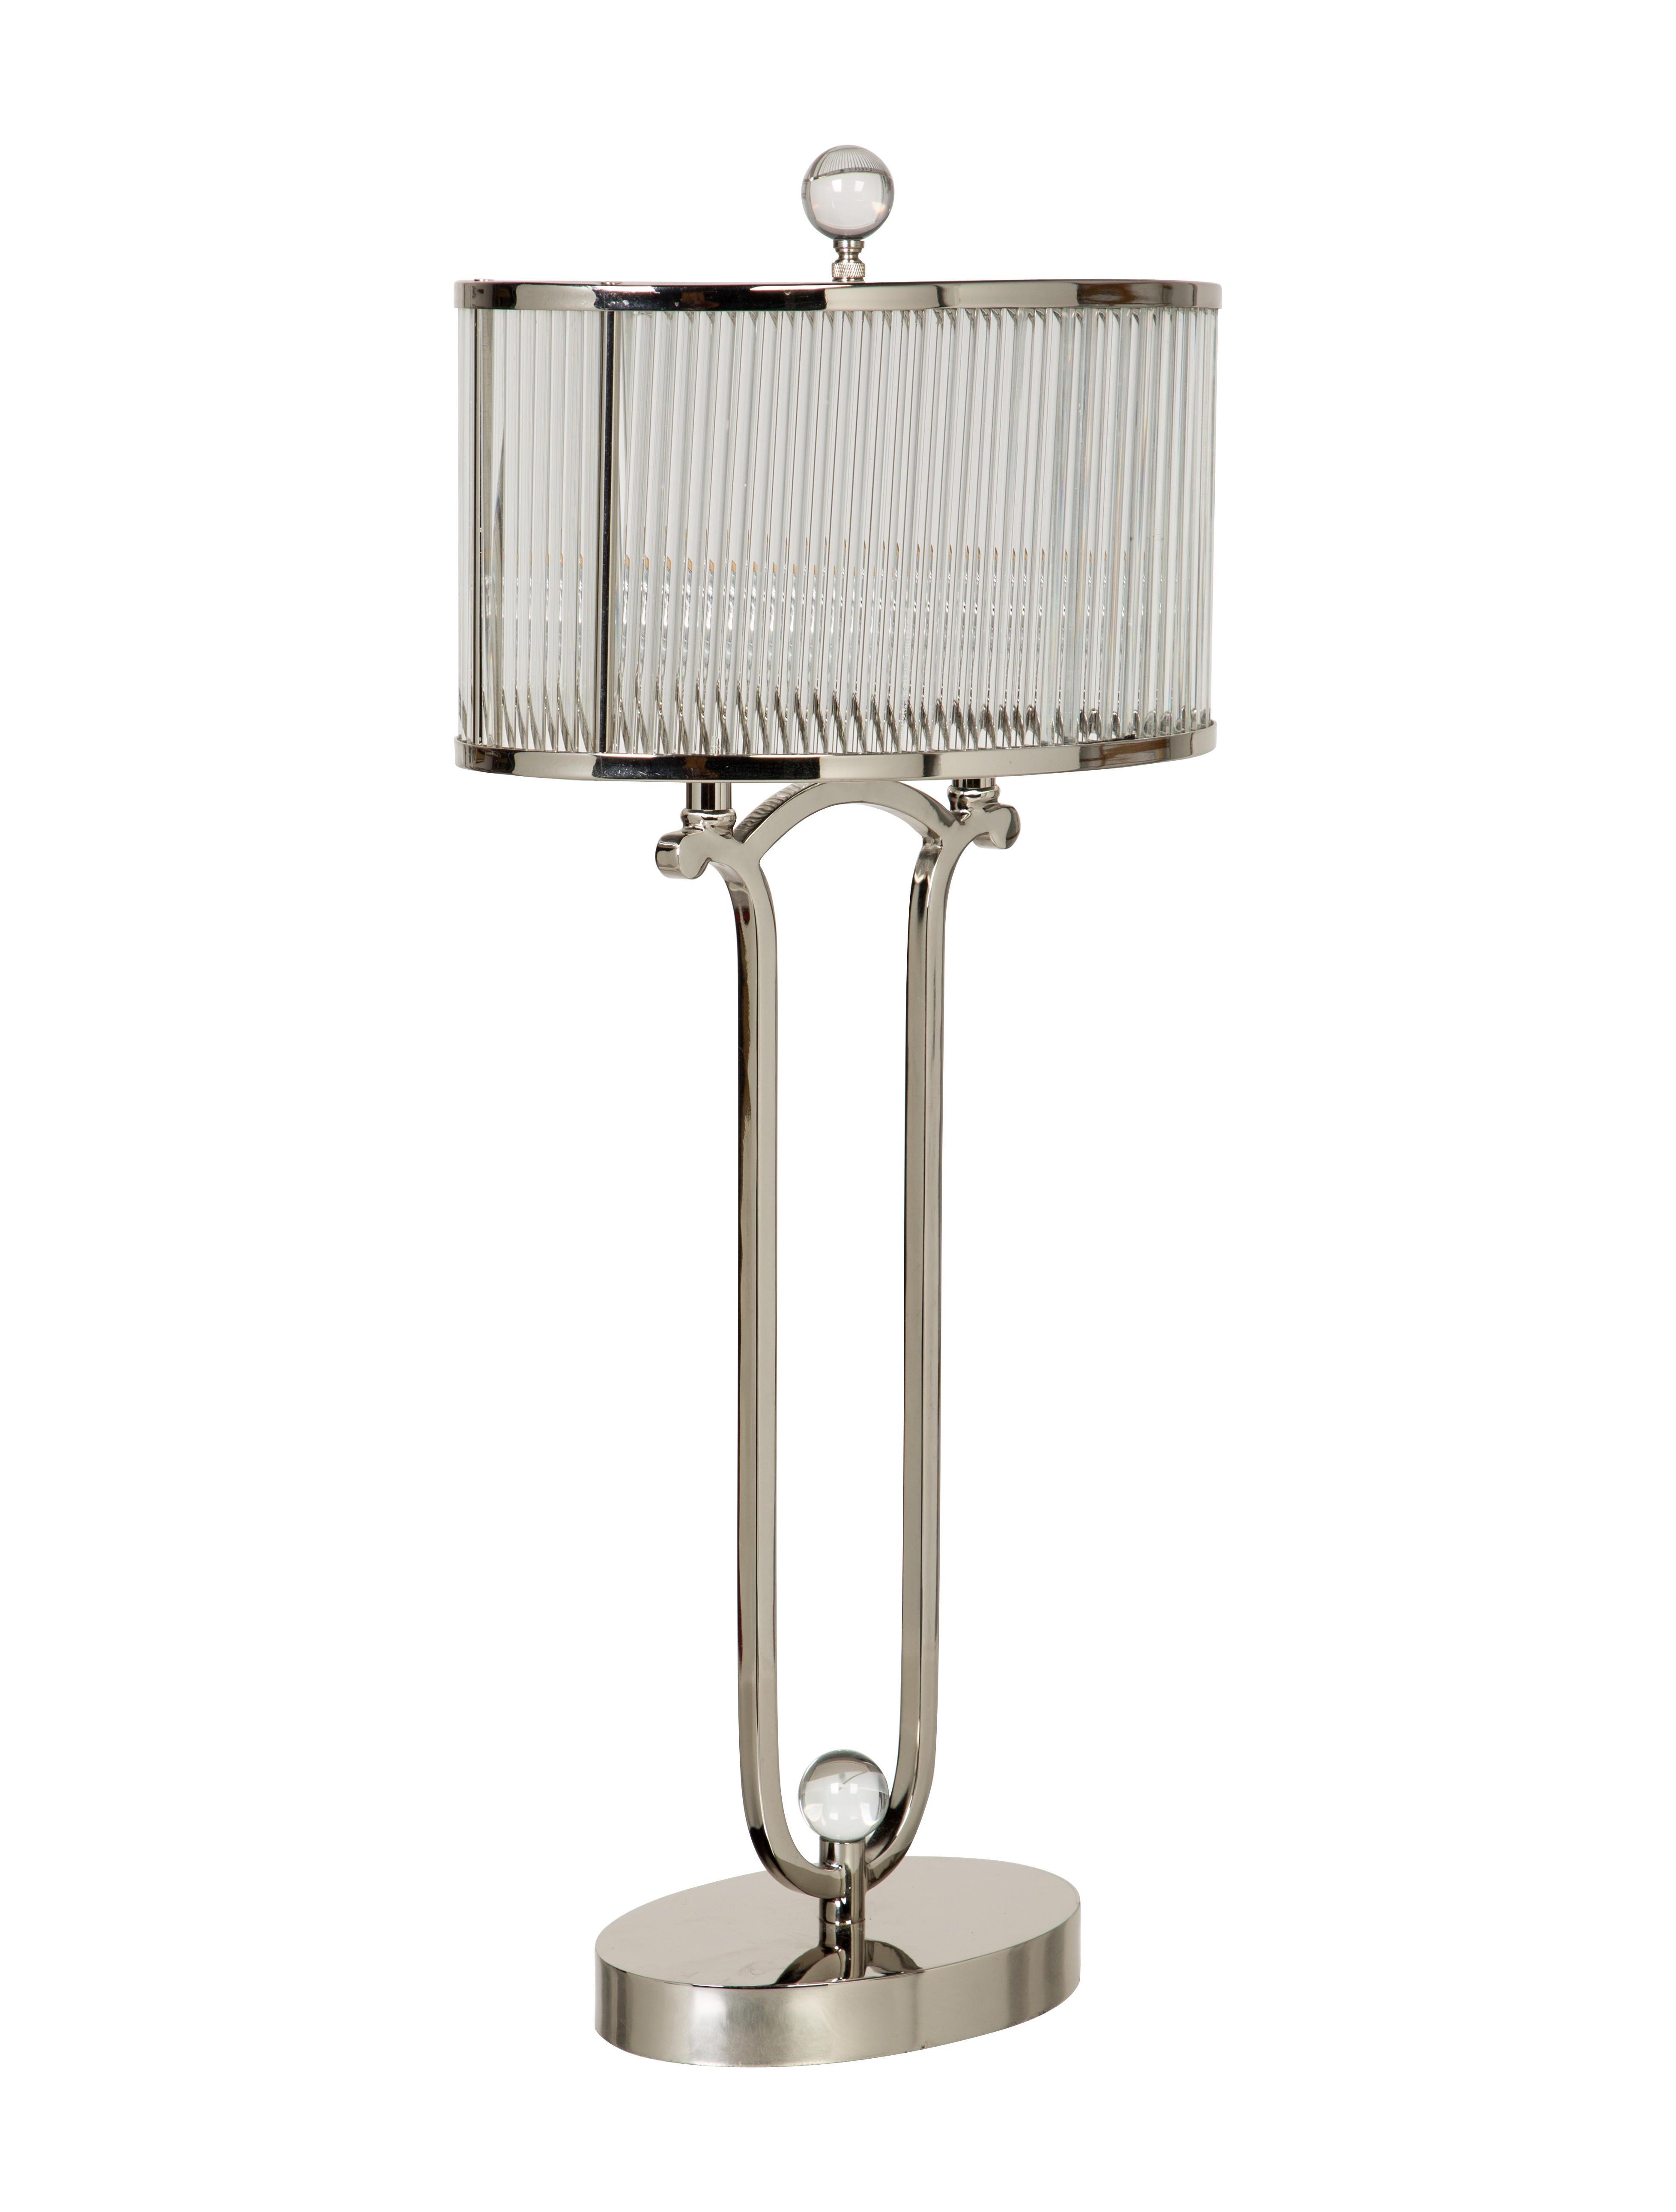 John richard glass table lamp lighting lghti20177 the realreal john richard glass table lamp geotapseo Image collections